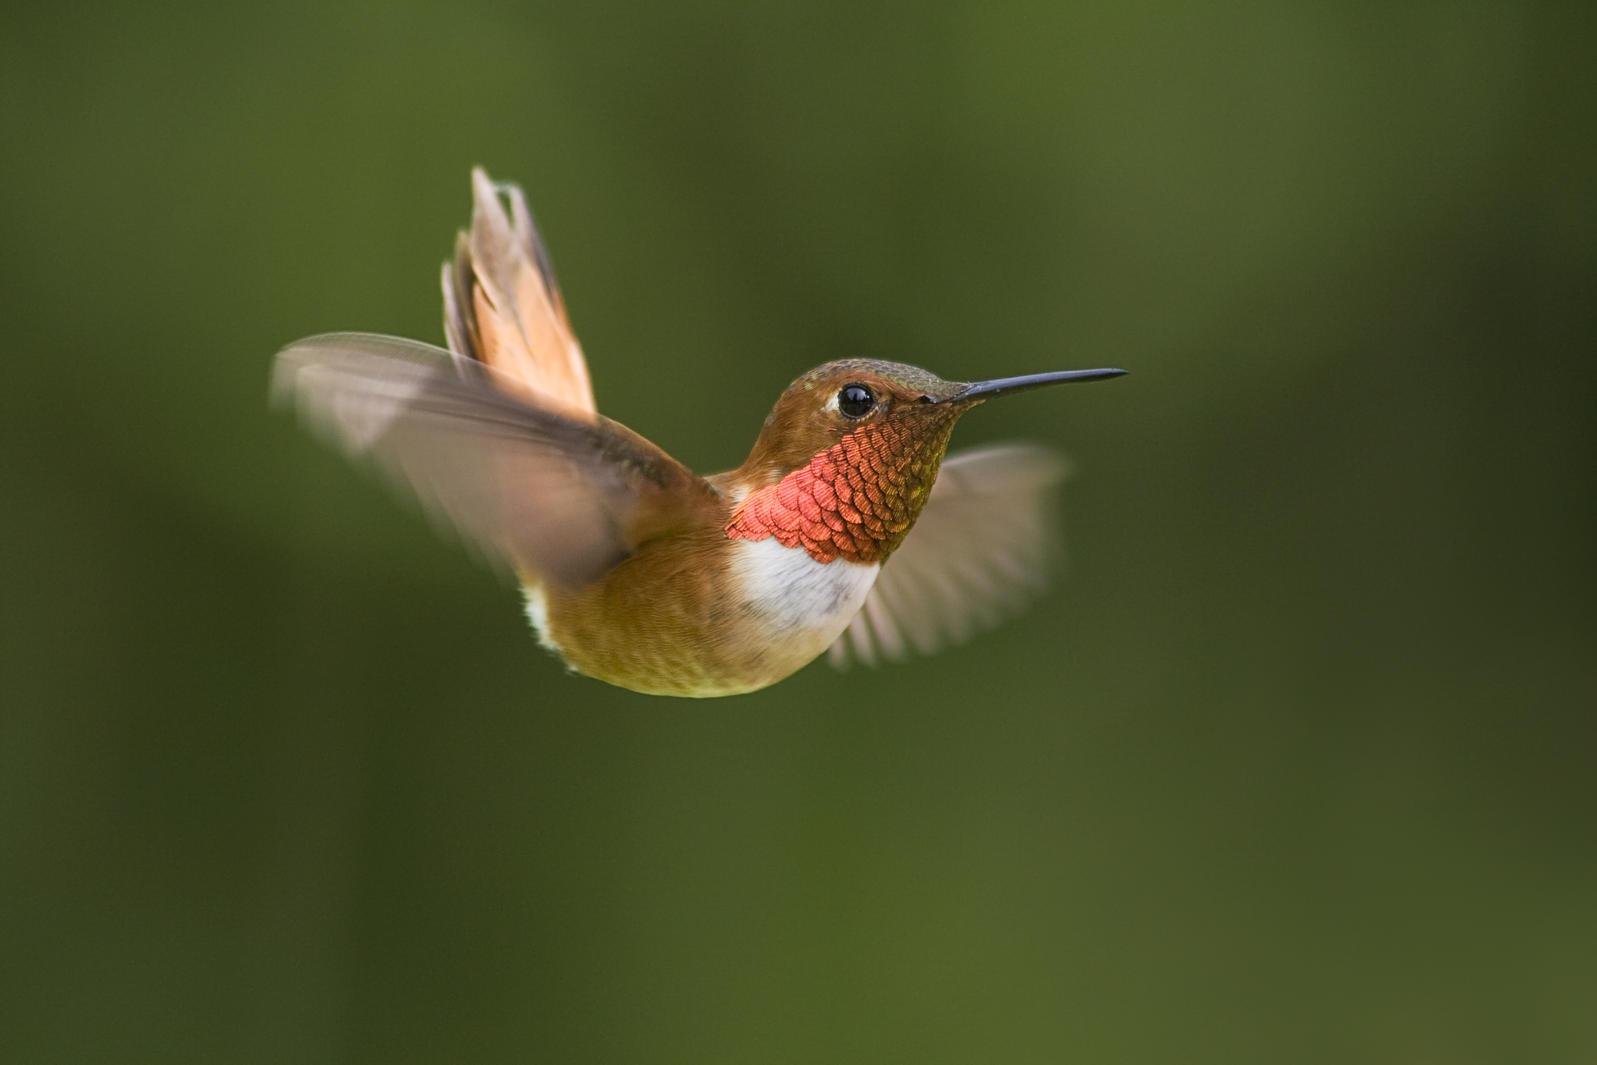 Rufous Hummingbirds Turning Up in Unusual Places | Audubon